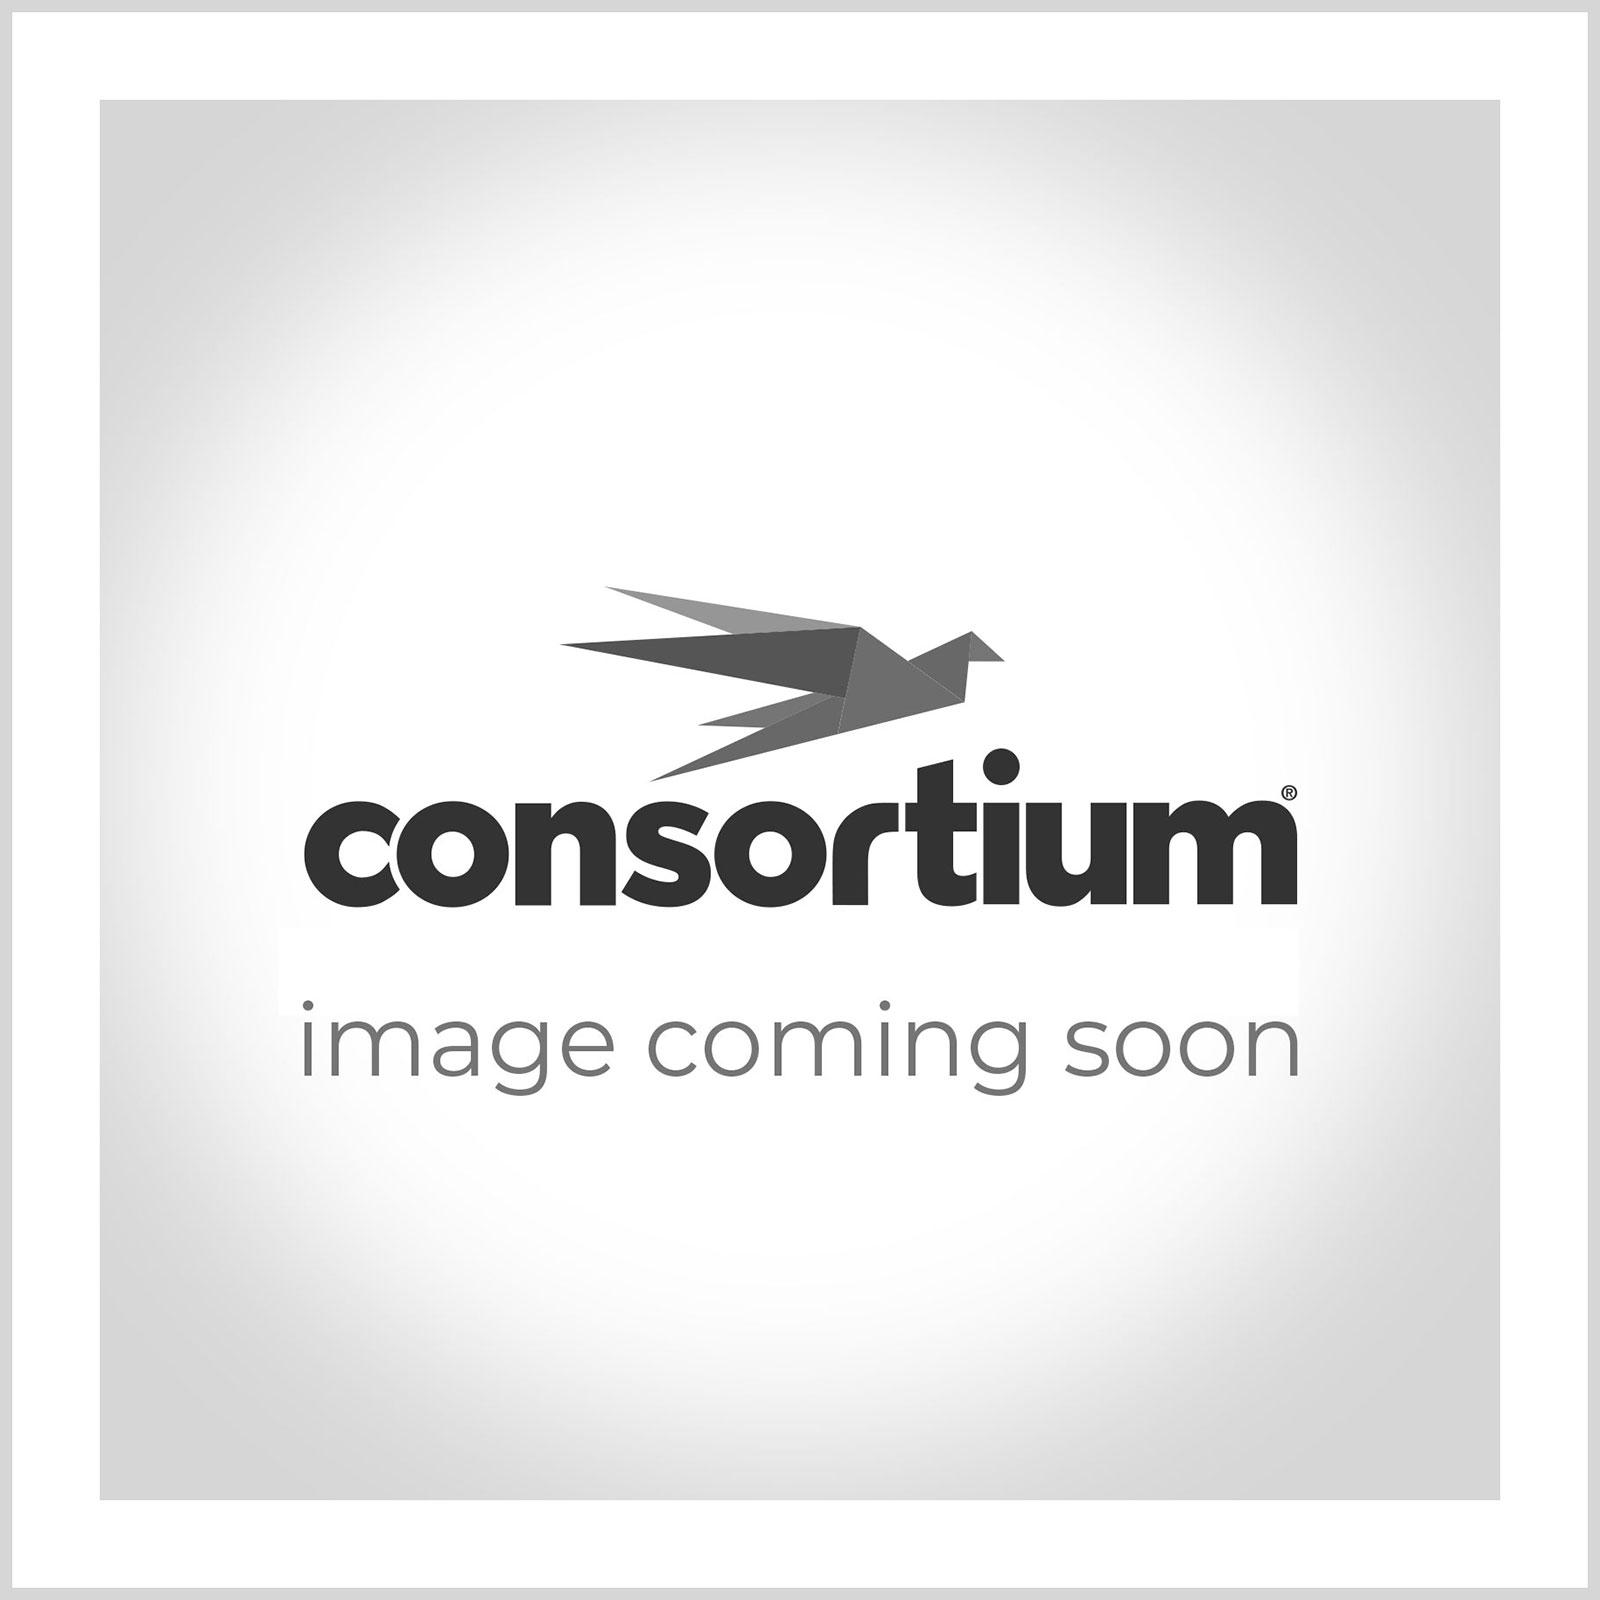 White Shatter Resistant 30cm Rulers